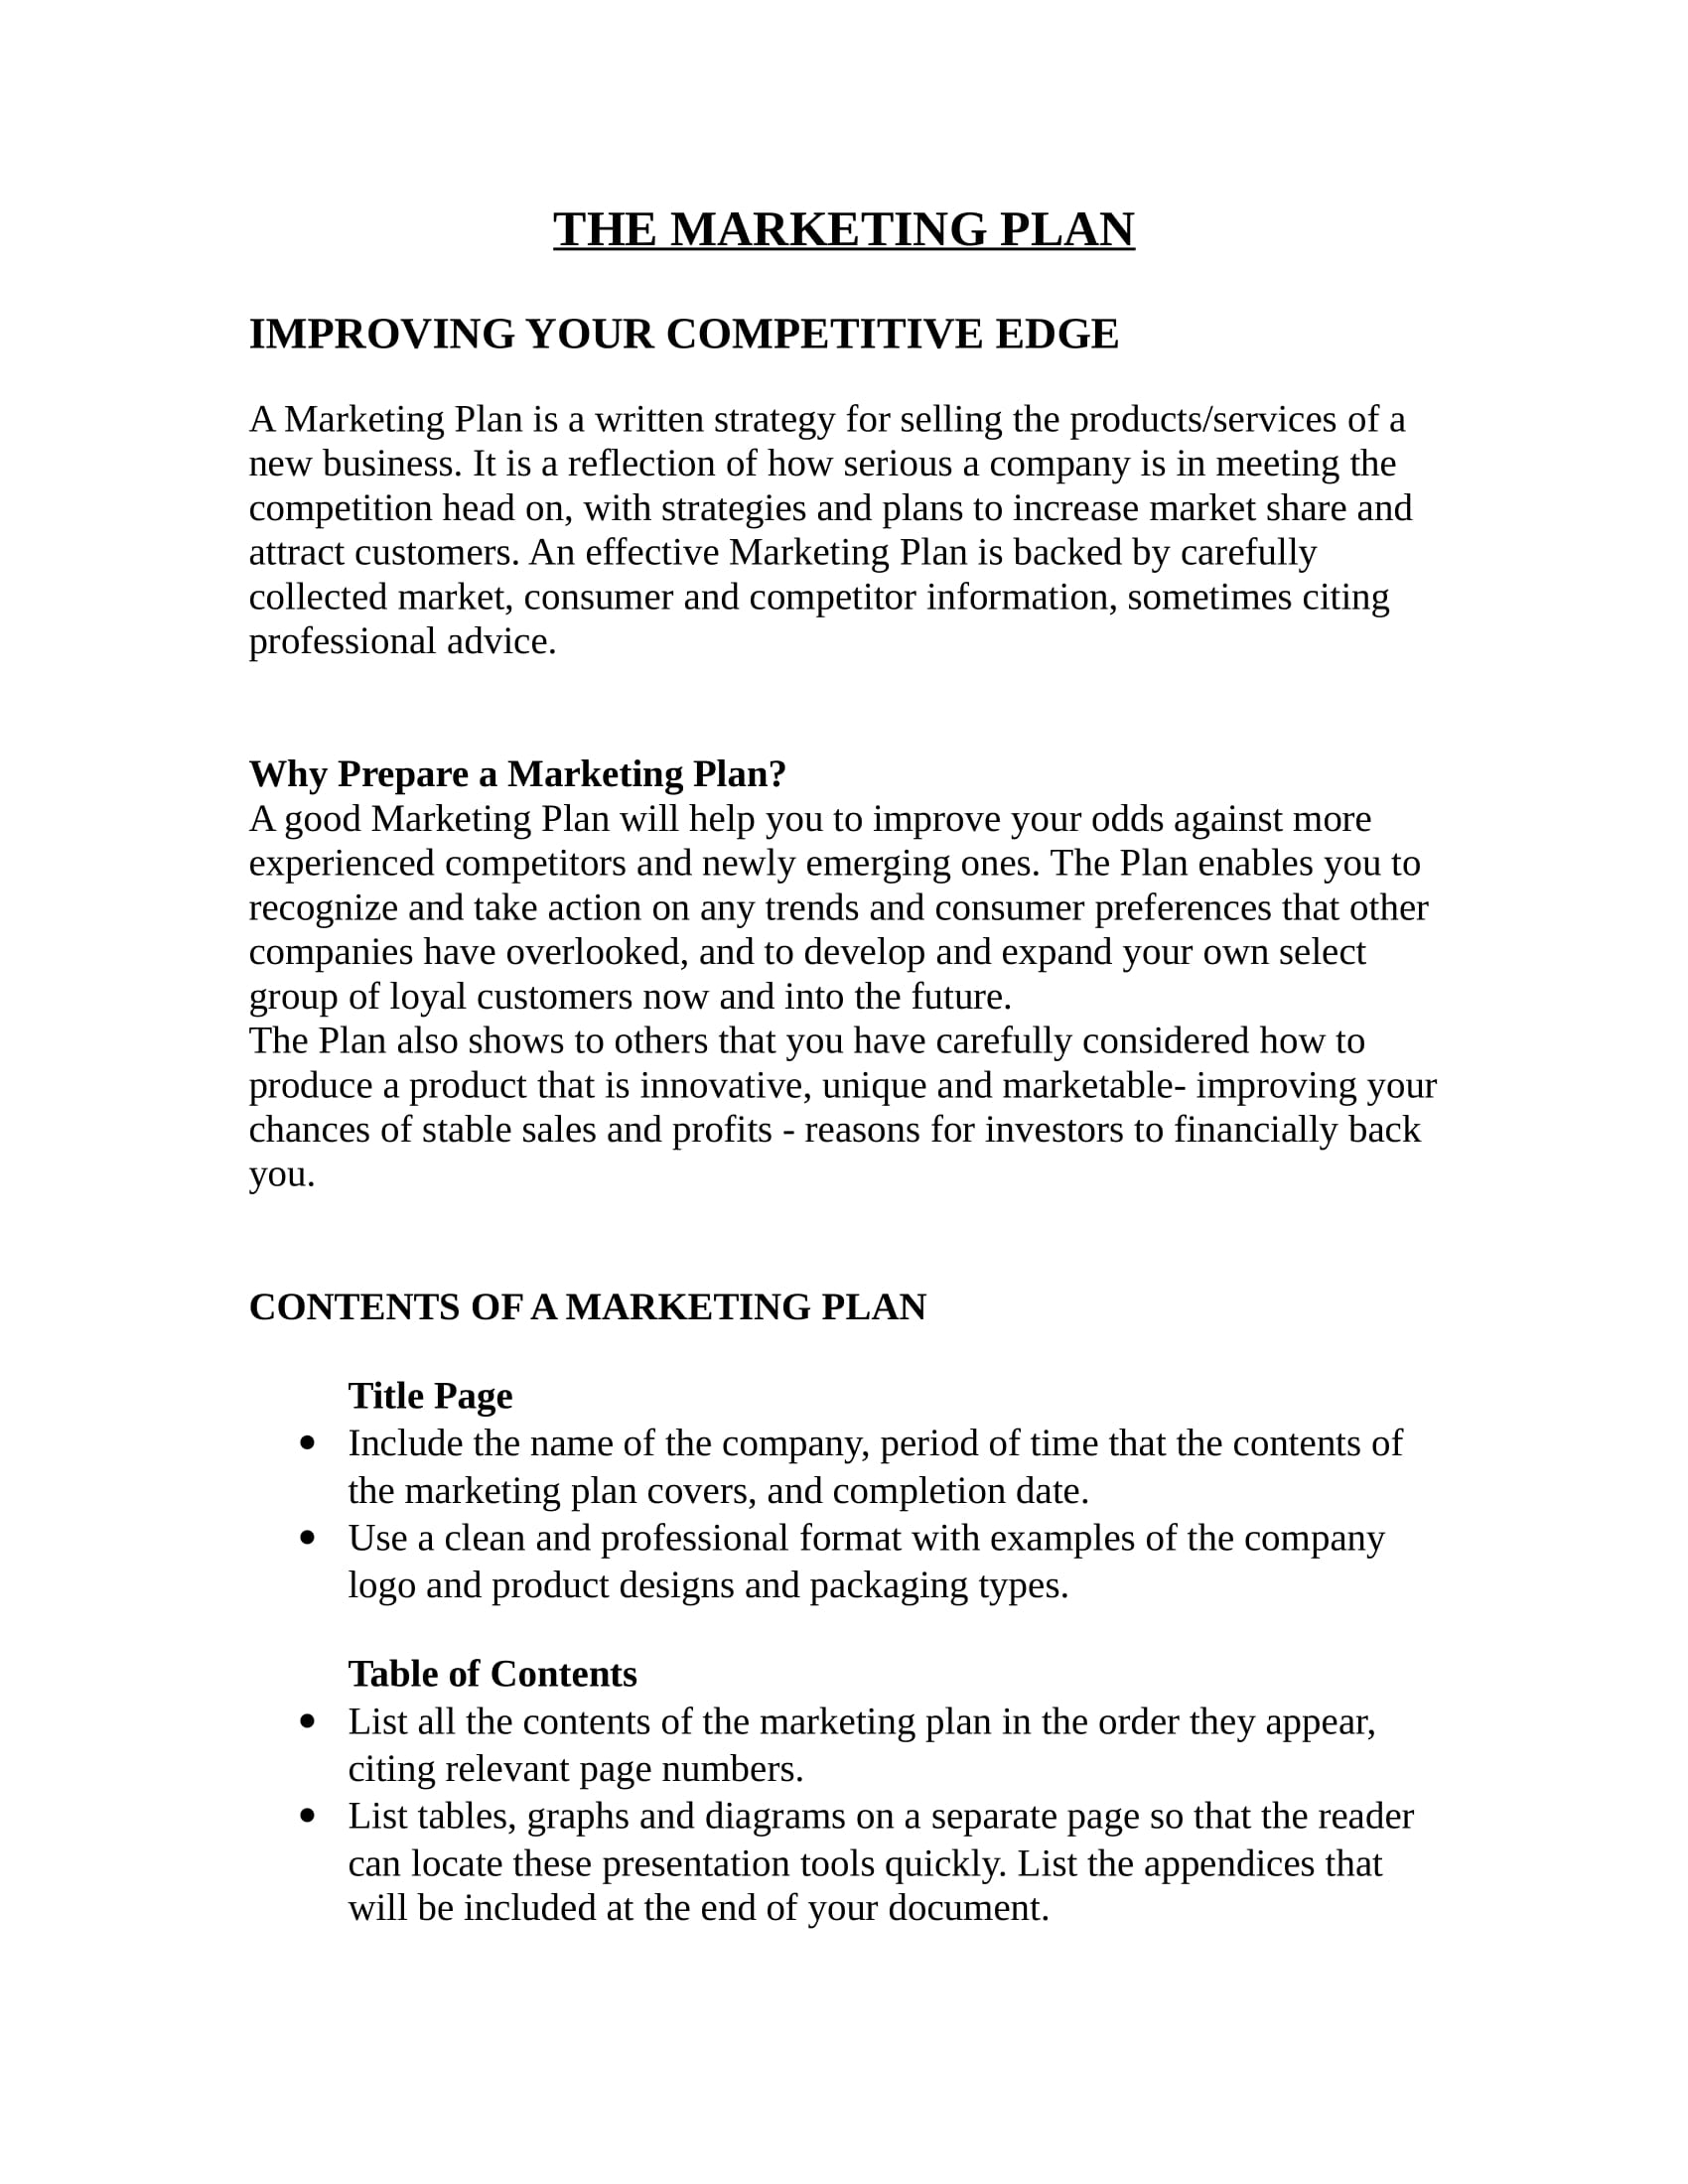 restaurant marketing plan template in doc 01